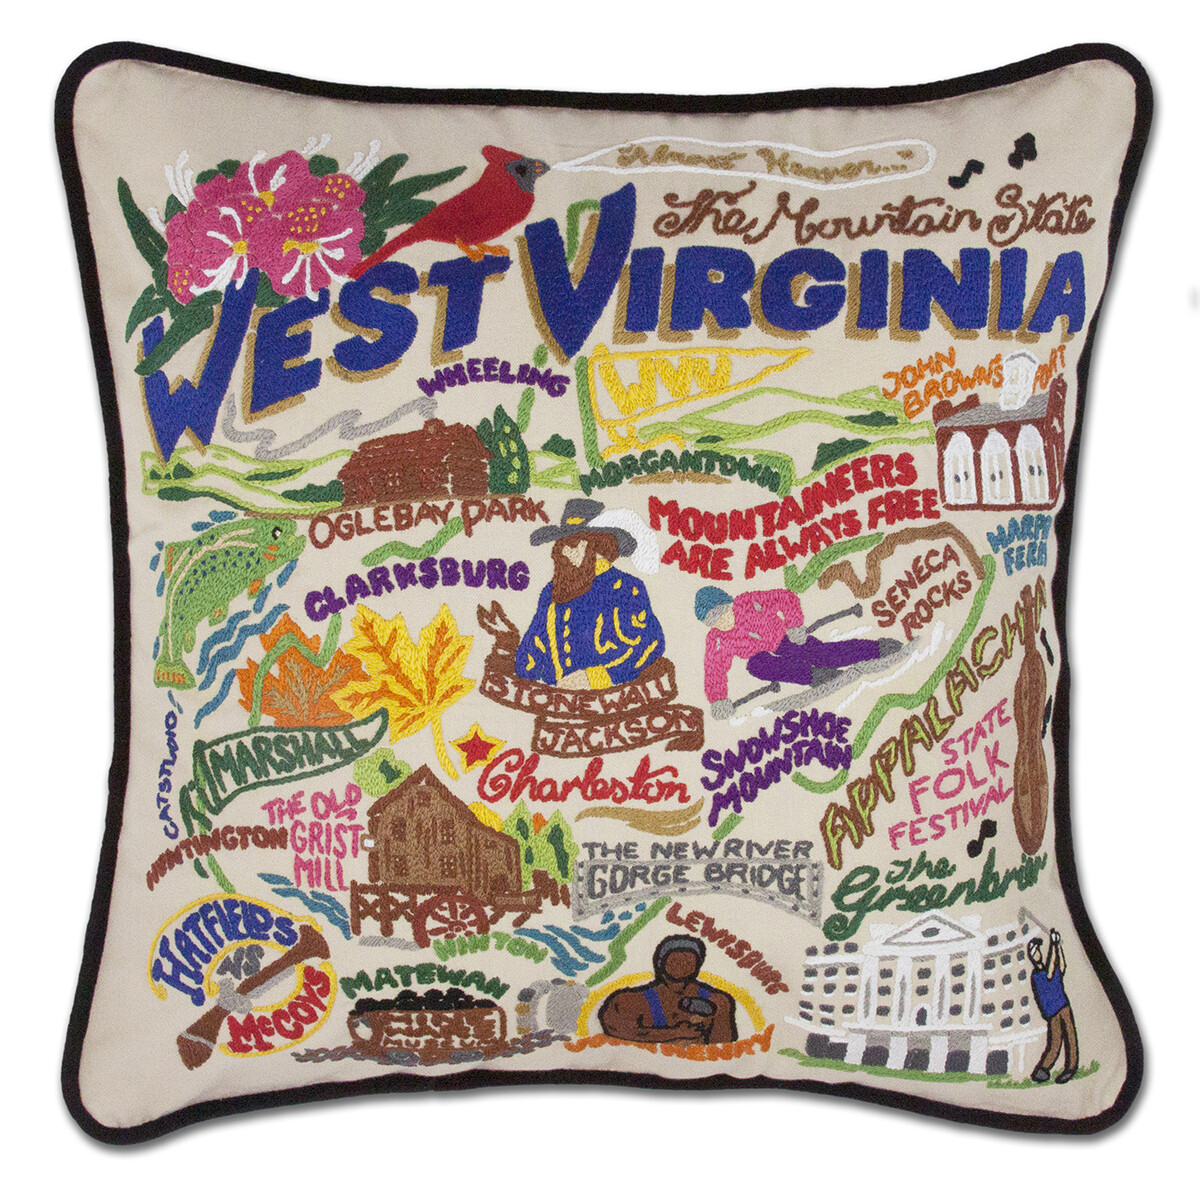 Catstudio West Virginia Hand-Embroidered Pillow